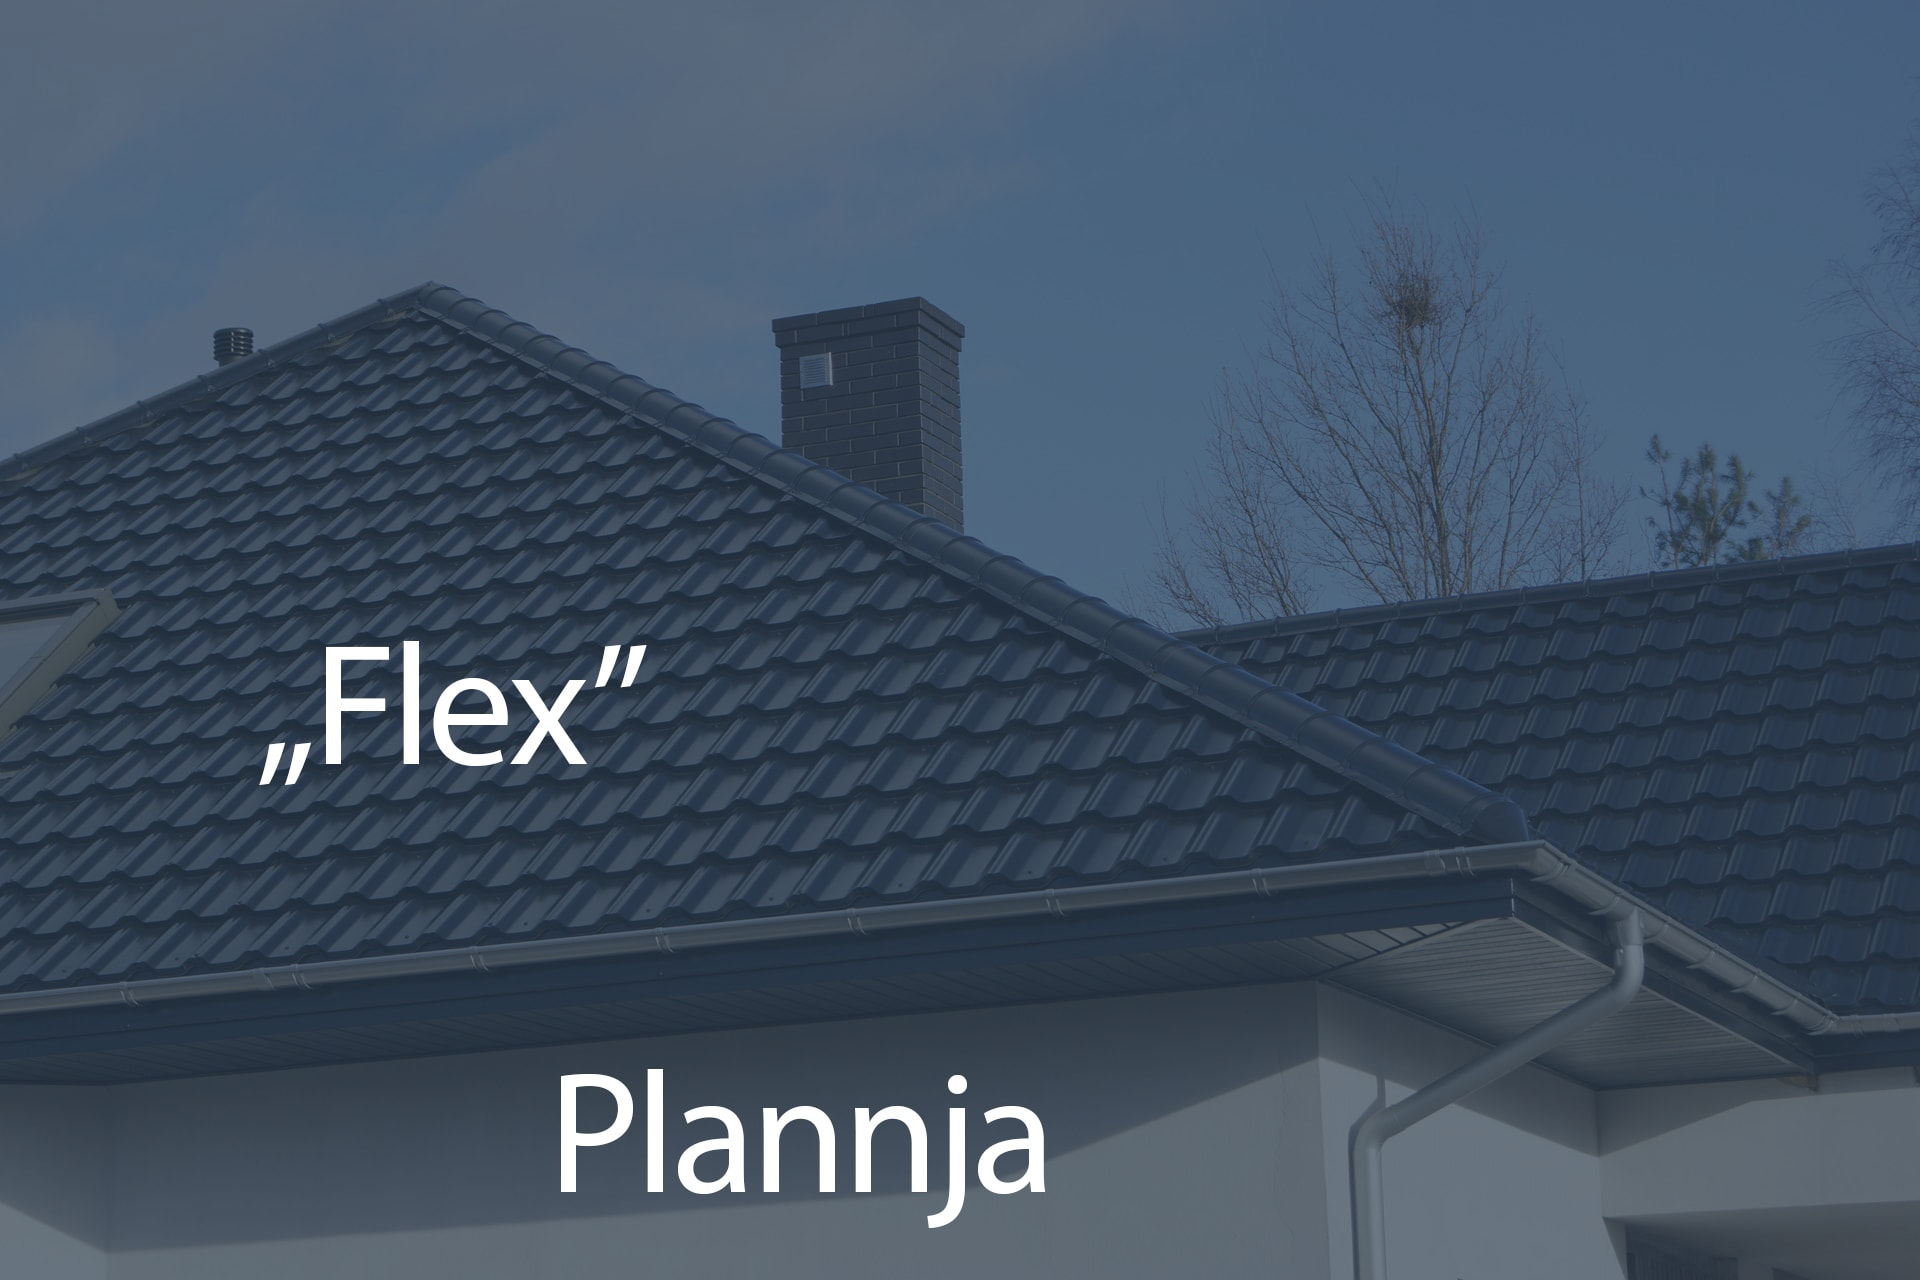 Plannja Flex